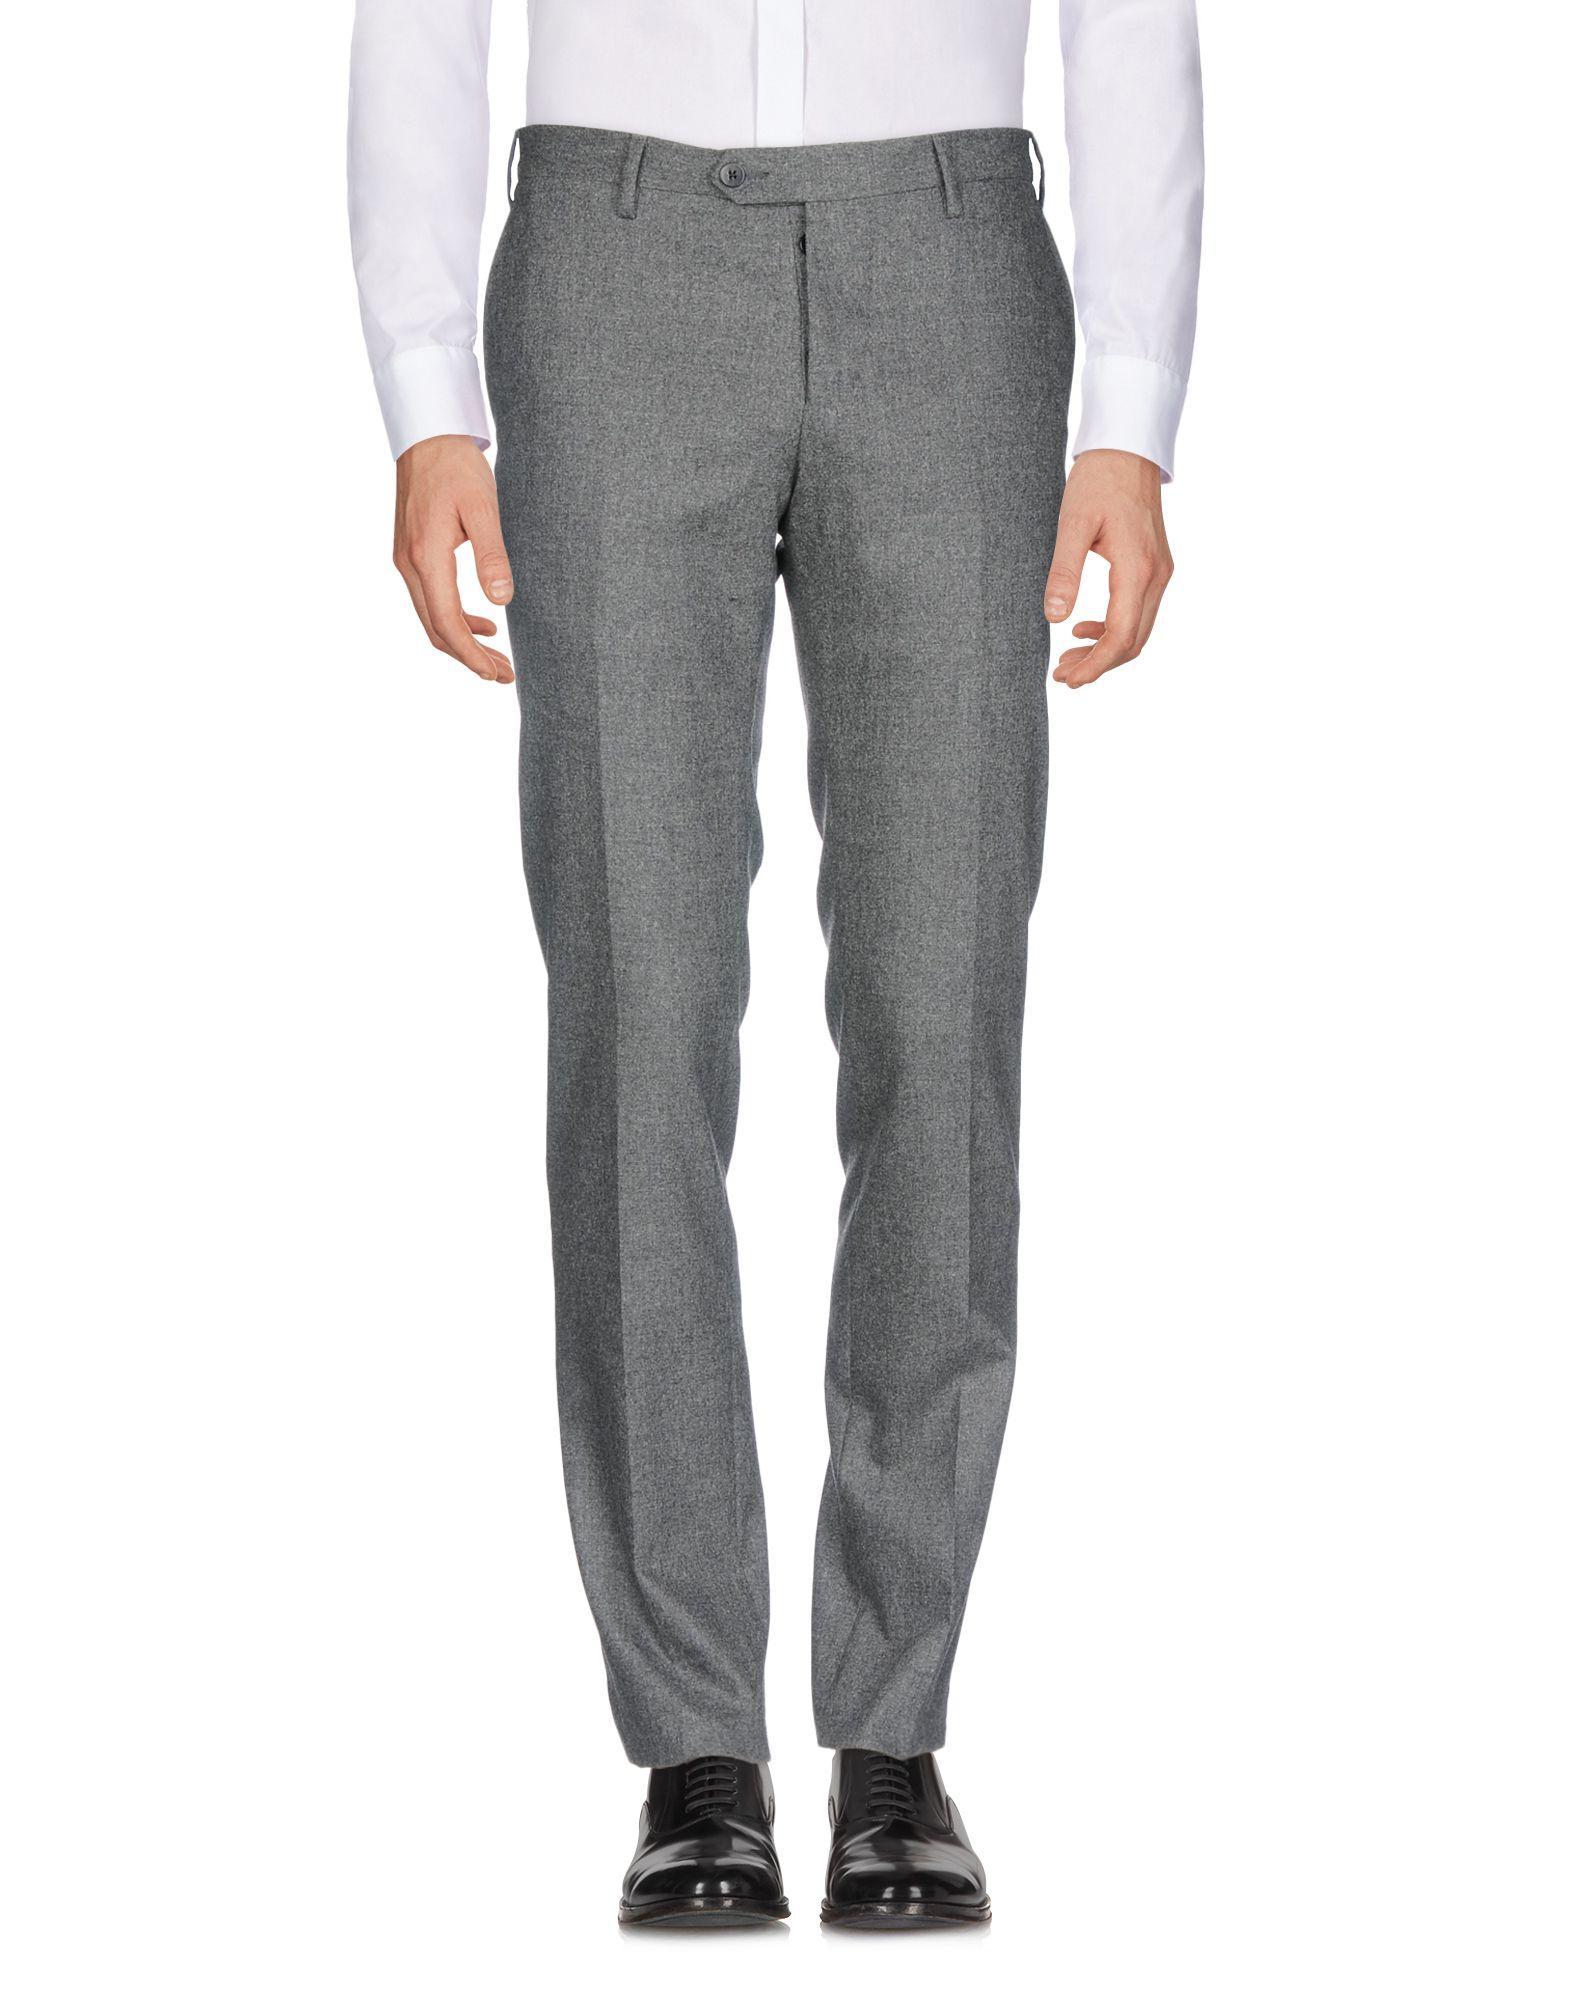 Marco Pescarolo Casual Pants In Steel Grey